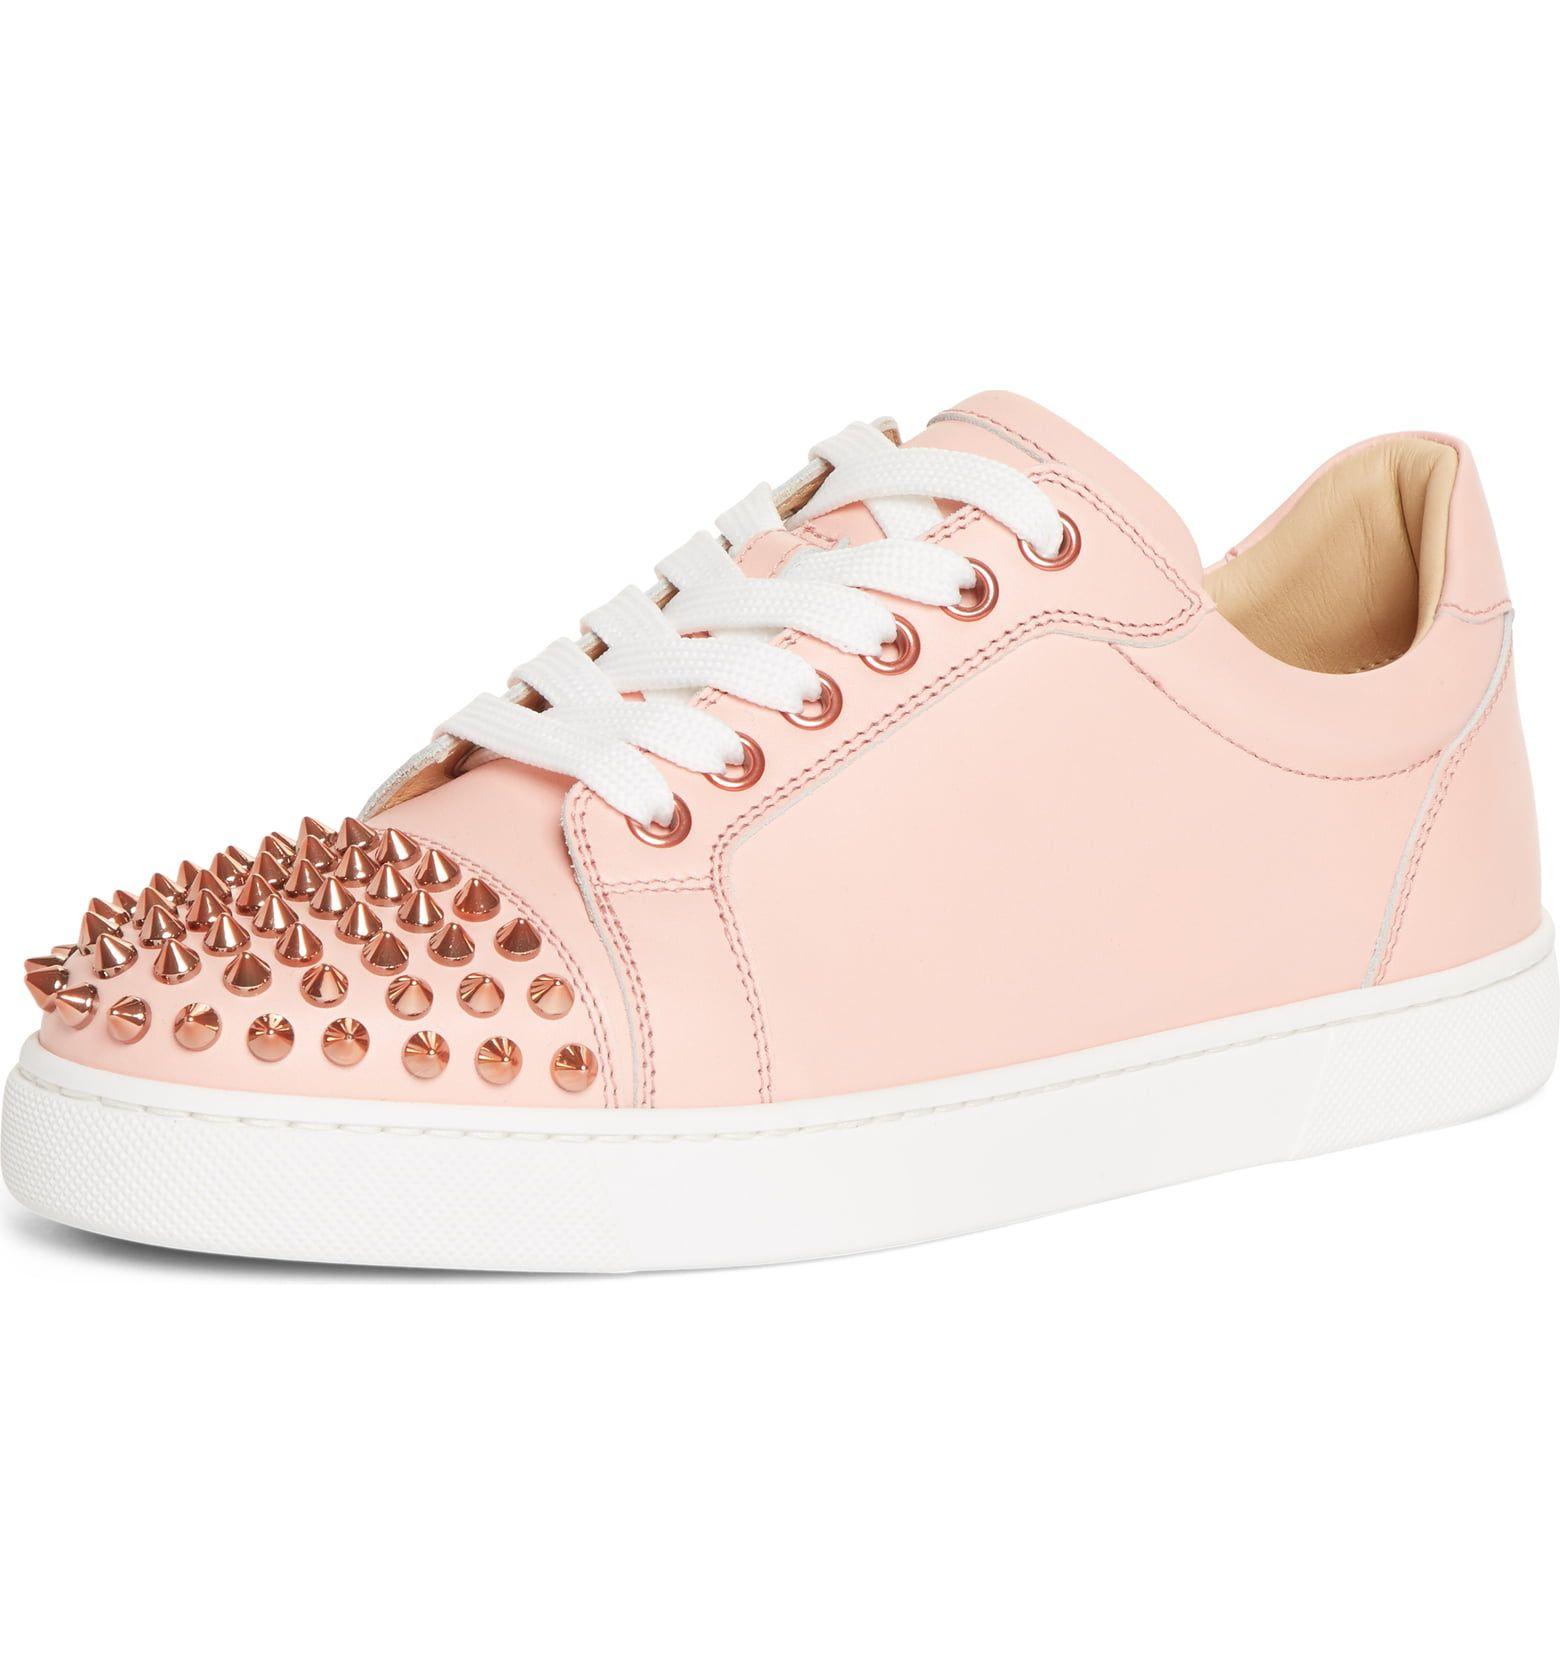 5da0cc39983 Christian Louboutin Vieira Spiked Low Top Sneaker (Women ...